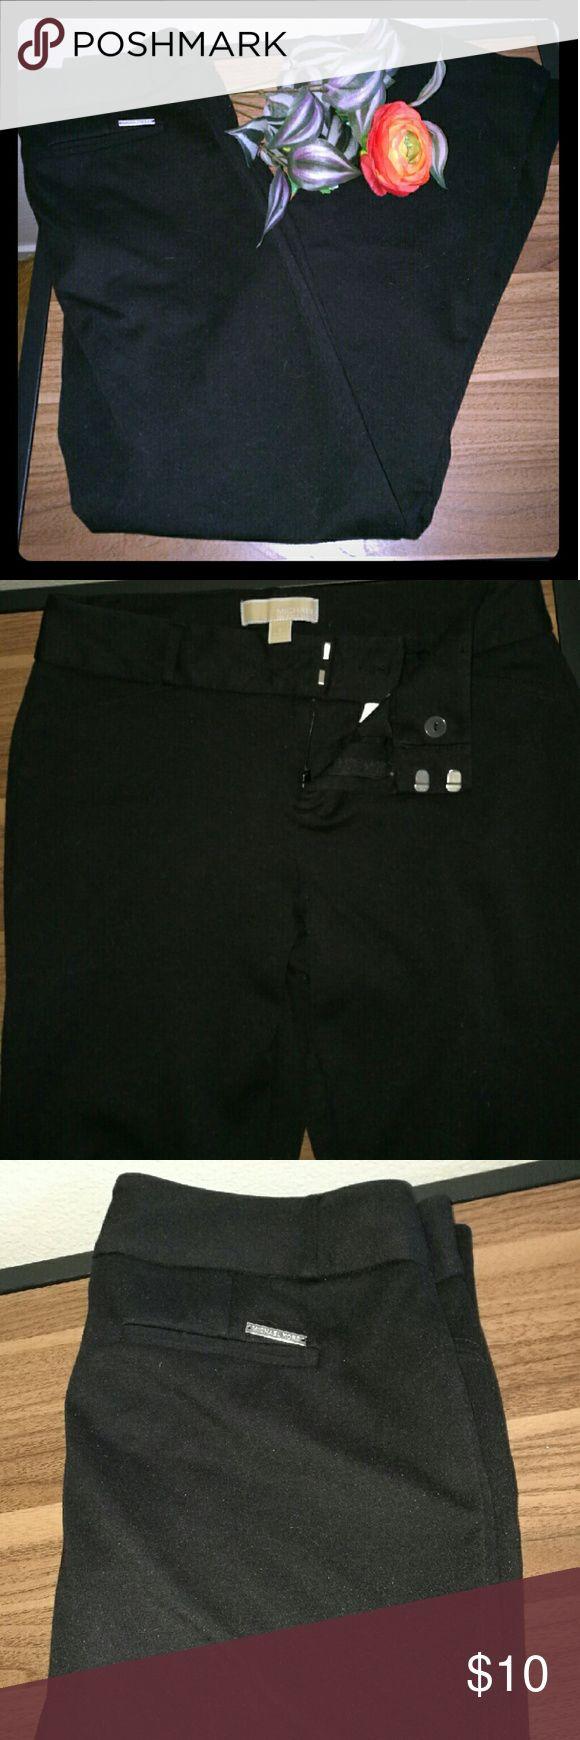 Michael Kors Skinny Pants/Leggings Black skinny pants. They fit like leggings but button like pants. Double tab, button, zip closure. Very stretchy, so they may fit the next size up. MICHAEL Michael Kors Pants Skinny